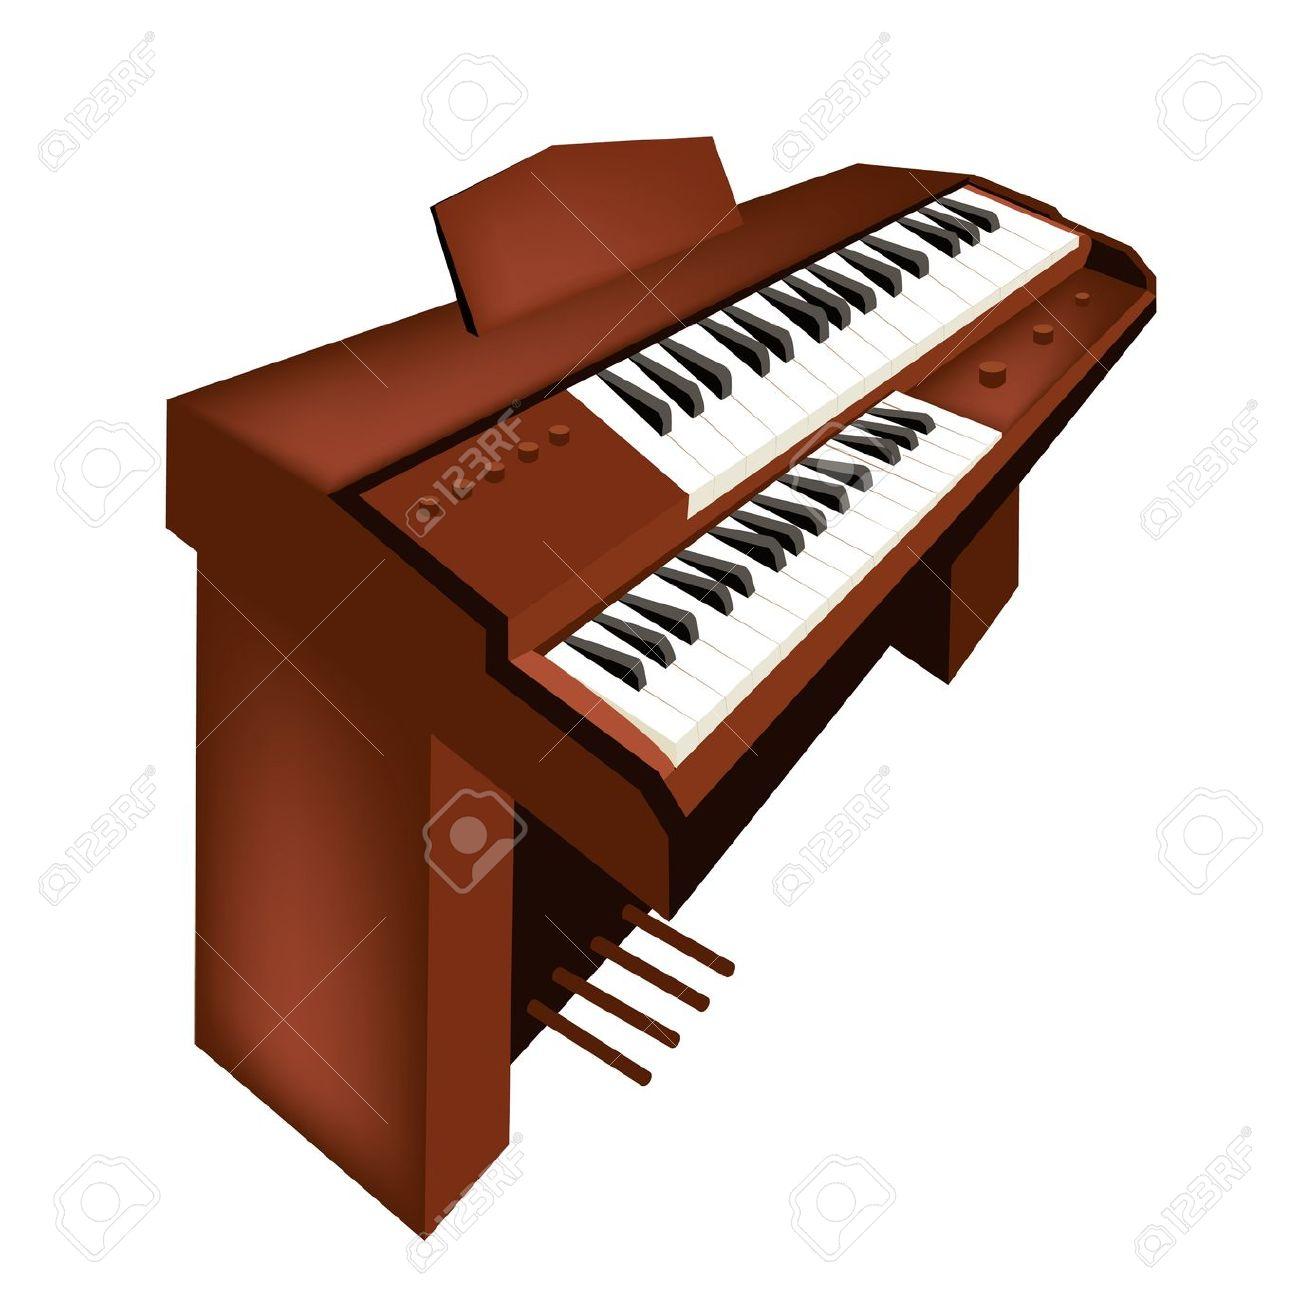 Pipe organ clipart free.